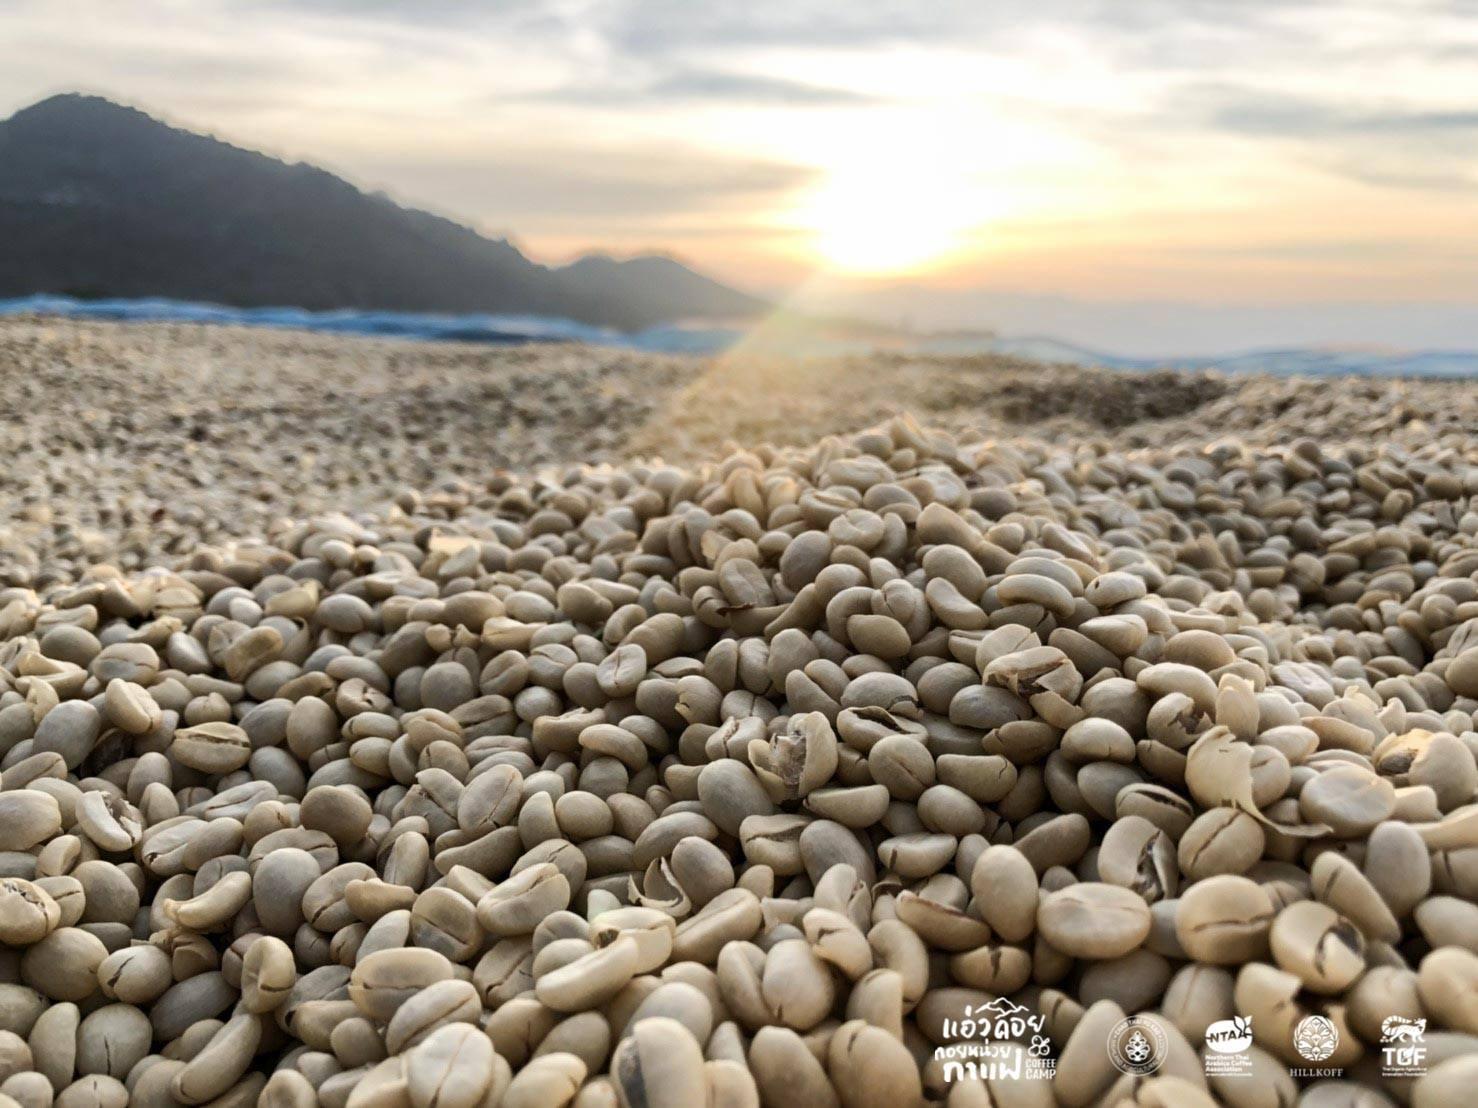 You are currently viewing รู้ไหม?….ทำไมกาแฟจึงสร้างรายได้และเป็นเครื่องดื่มที่ได้รับความนิยมจากทั่วทุกมุมโลก